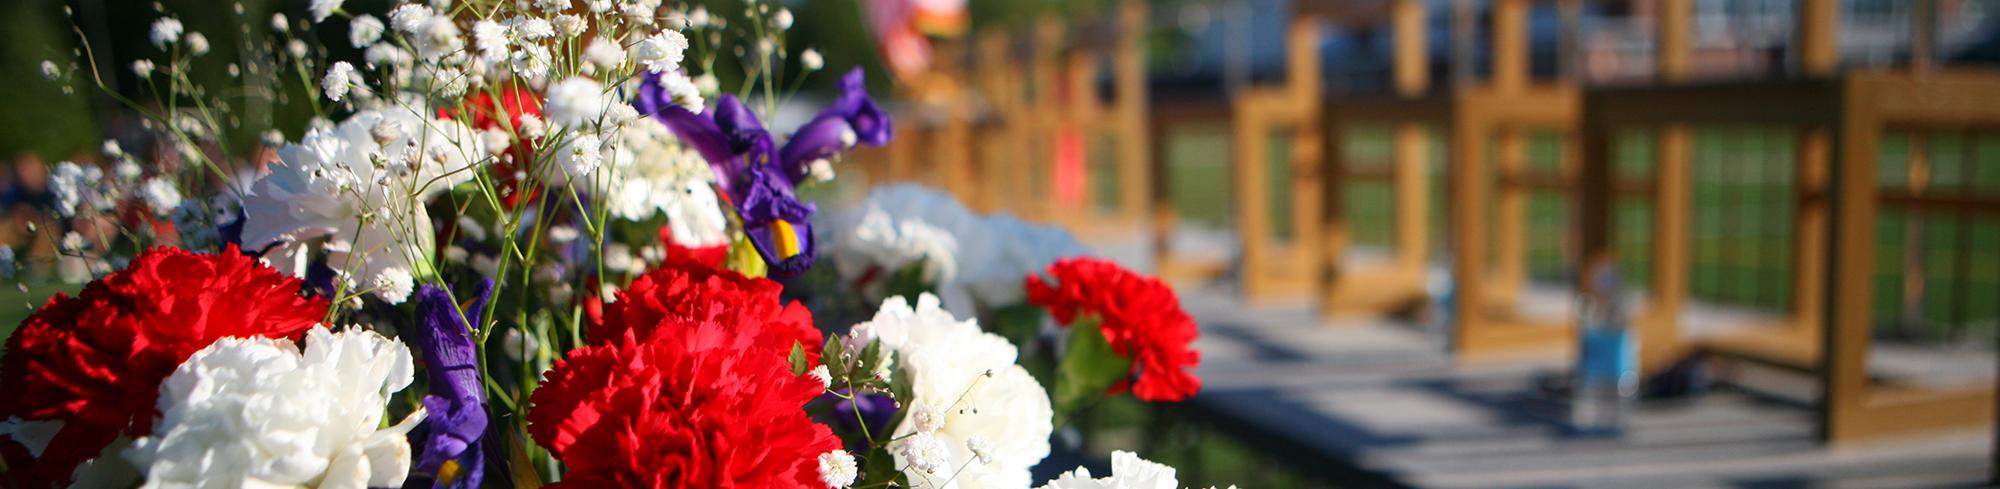 Graduation flowers outside